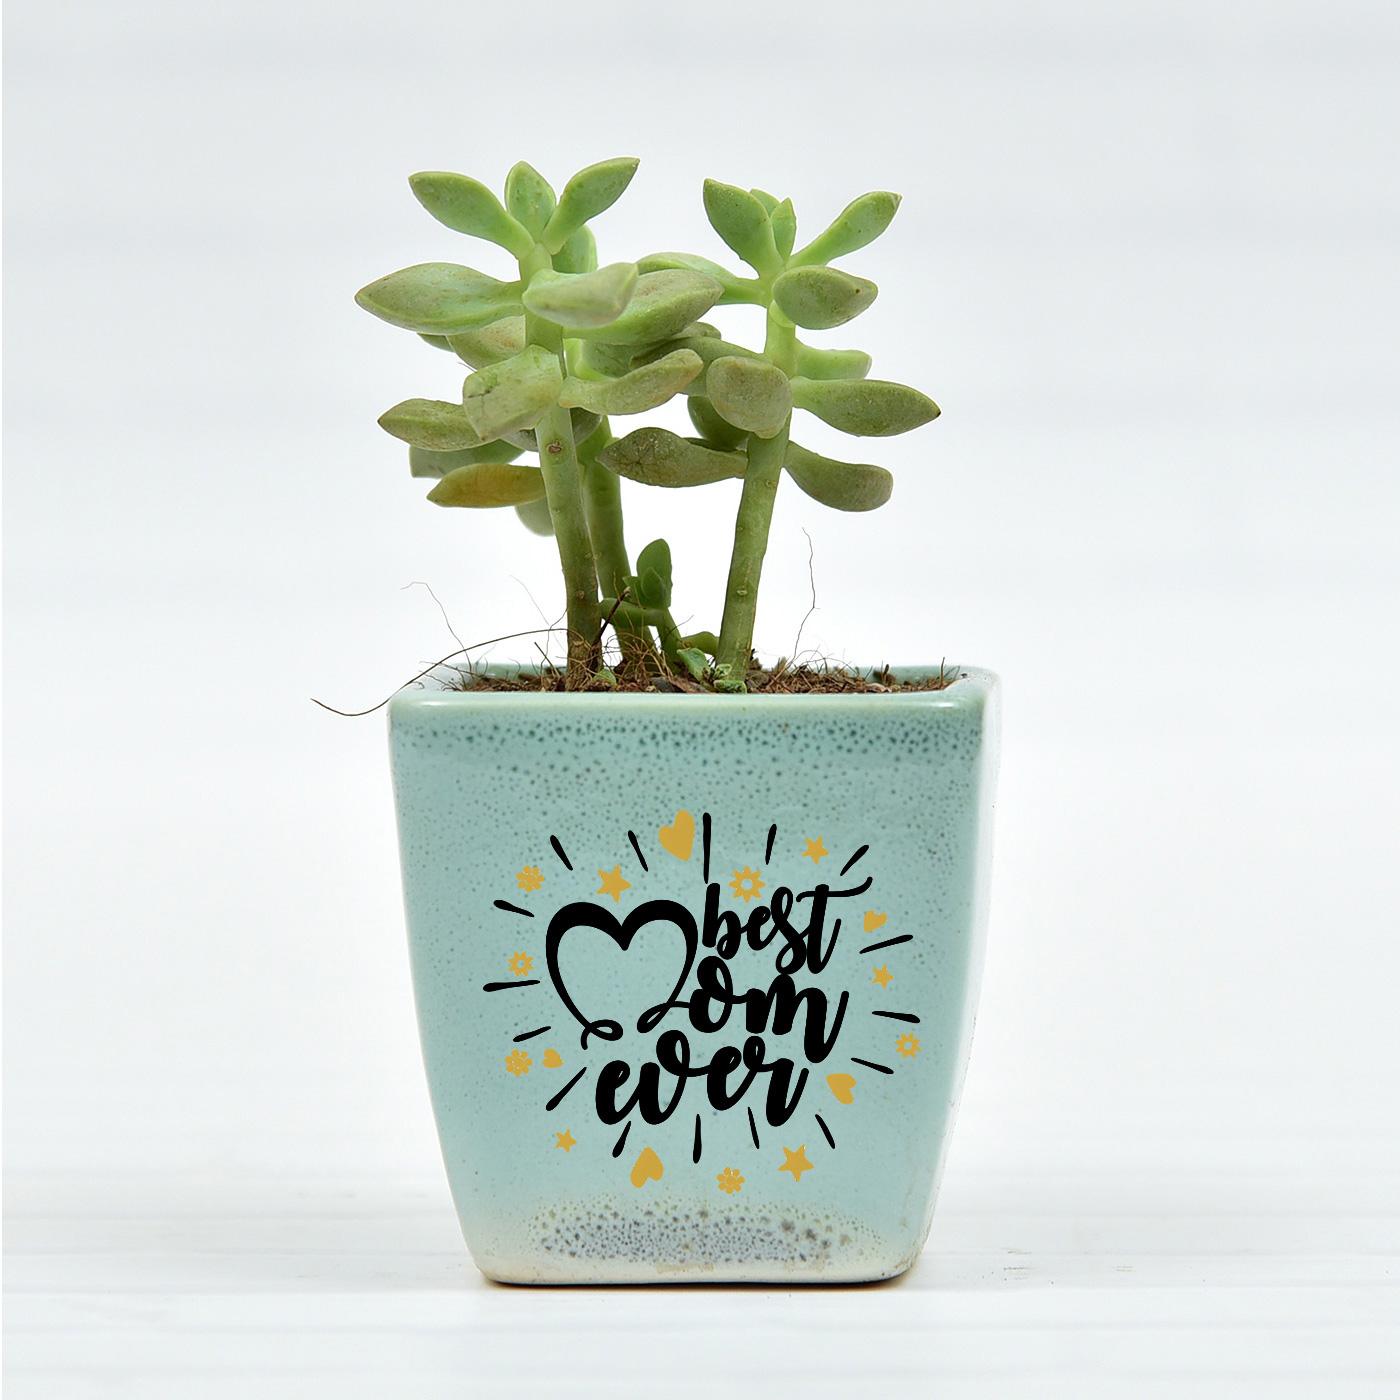 Cute-Echieviera-Succulent-In-Small-Ceramic-Planter